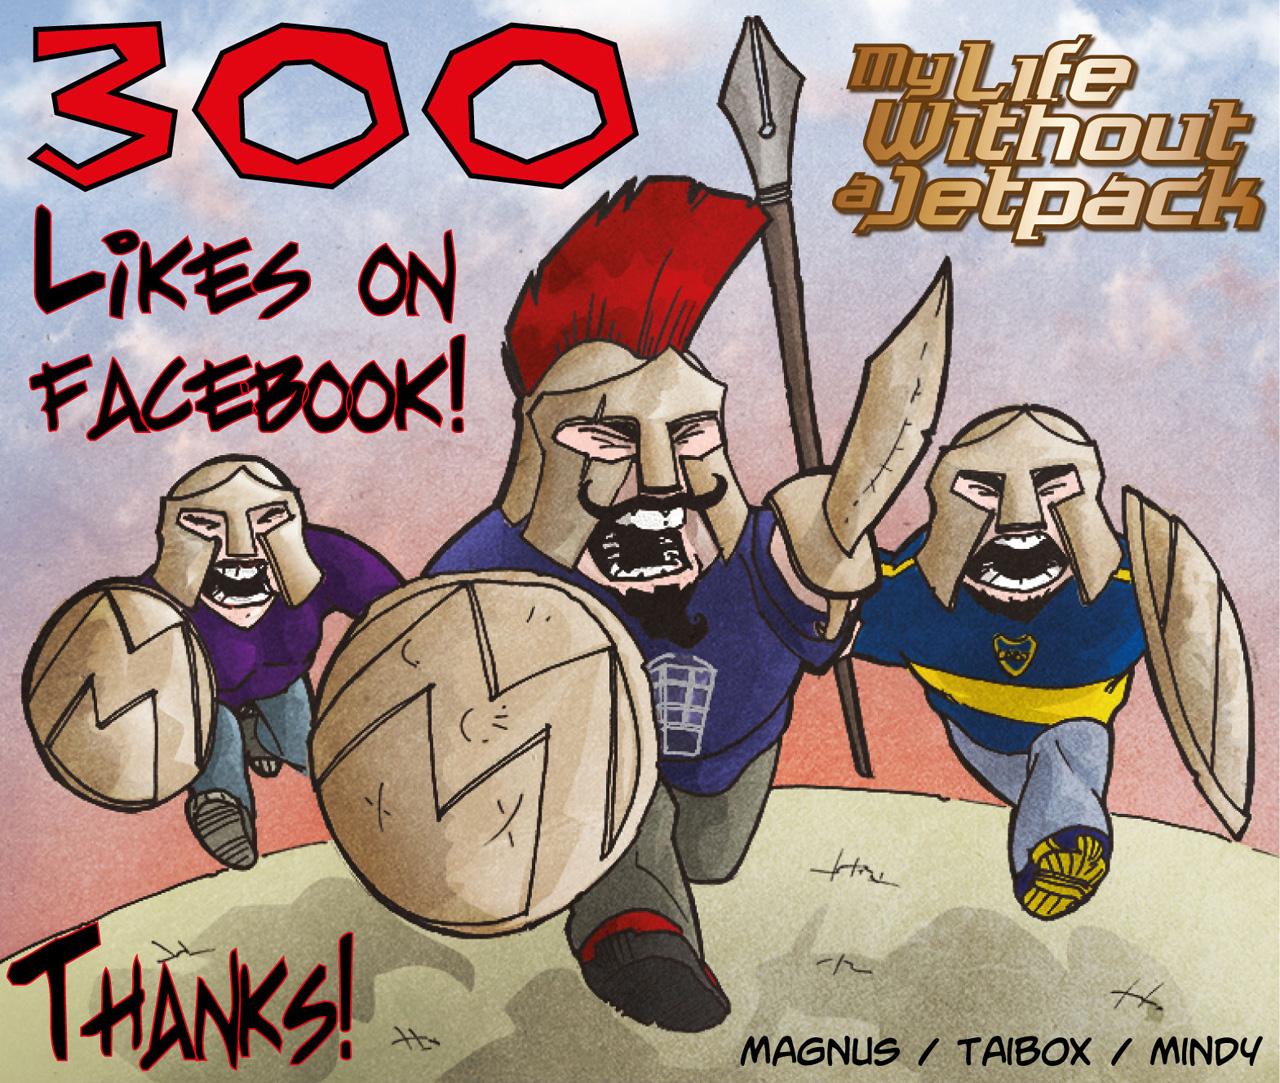 300 Facebook Fans!